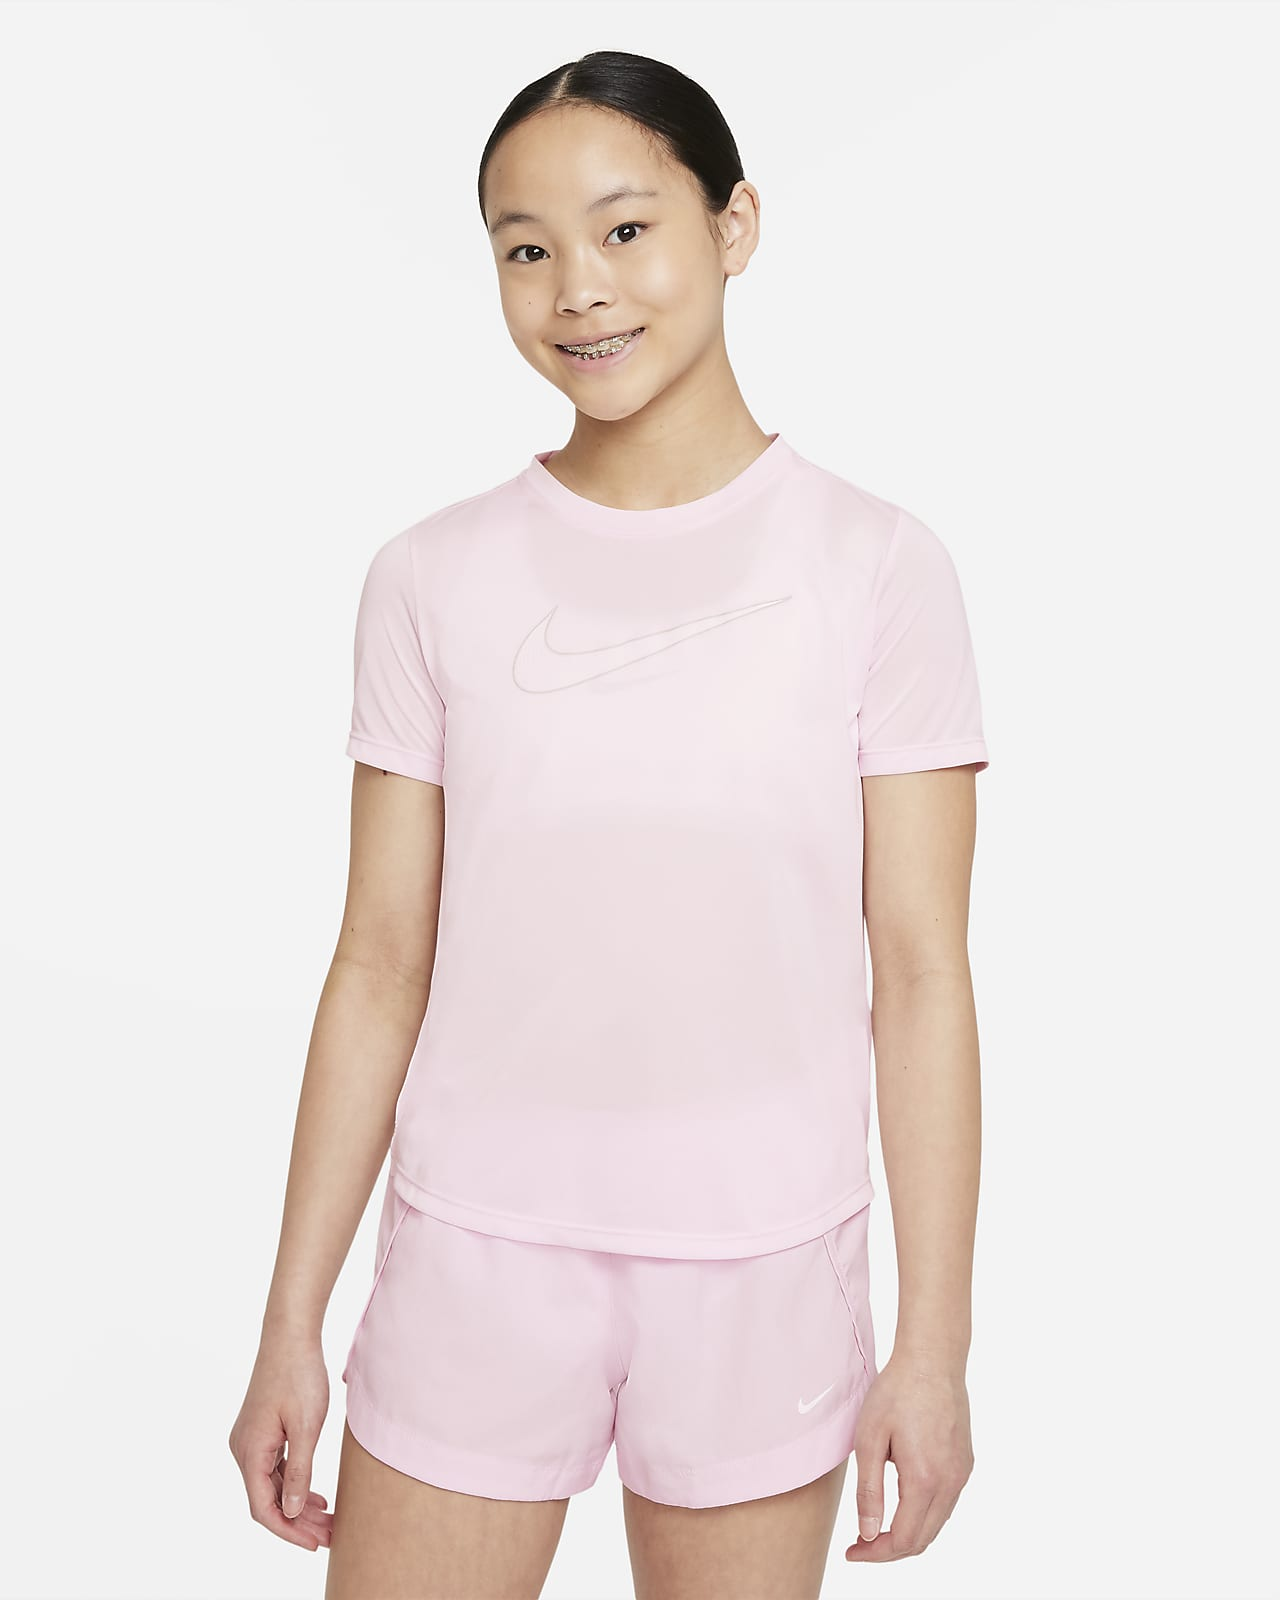 Nike Dri-FIT One Big Kids' (Girls') Short-Sleeve Training Top